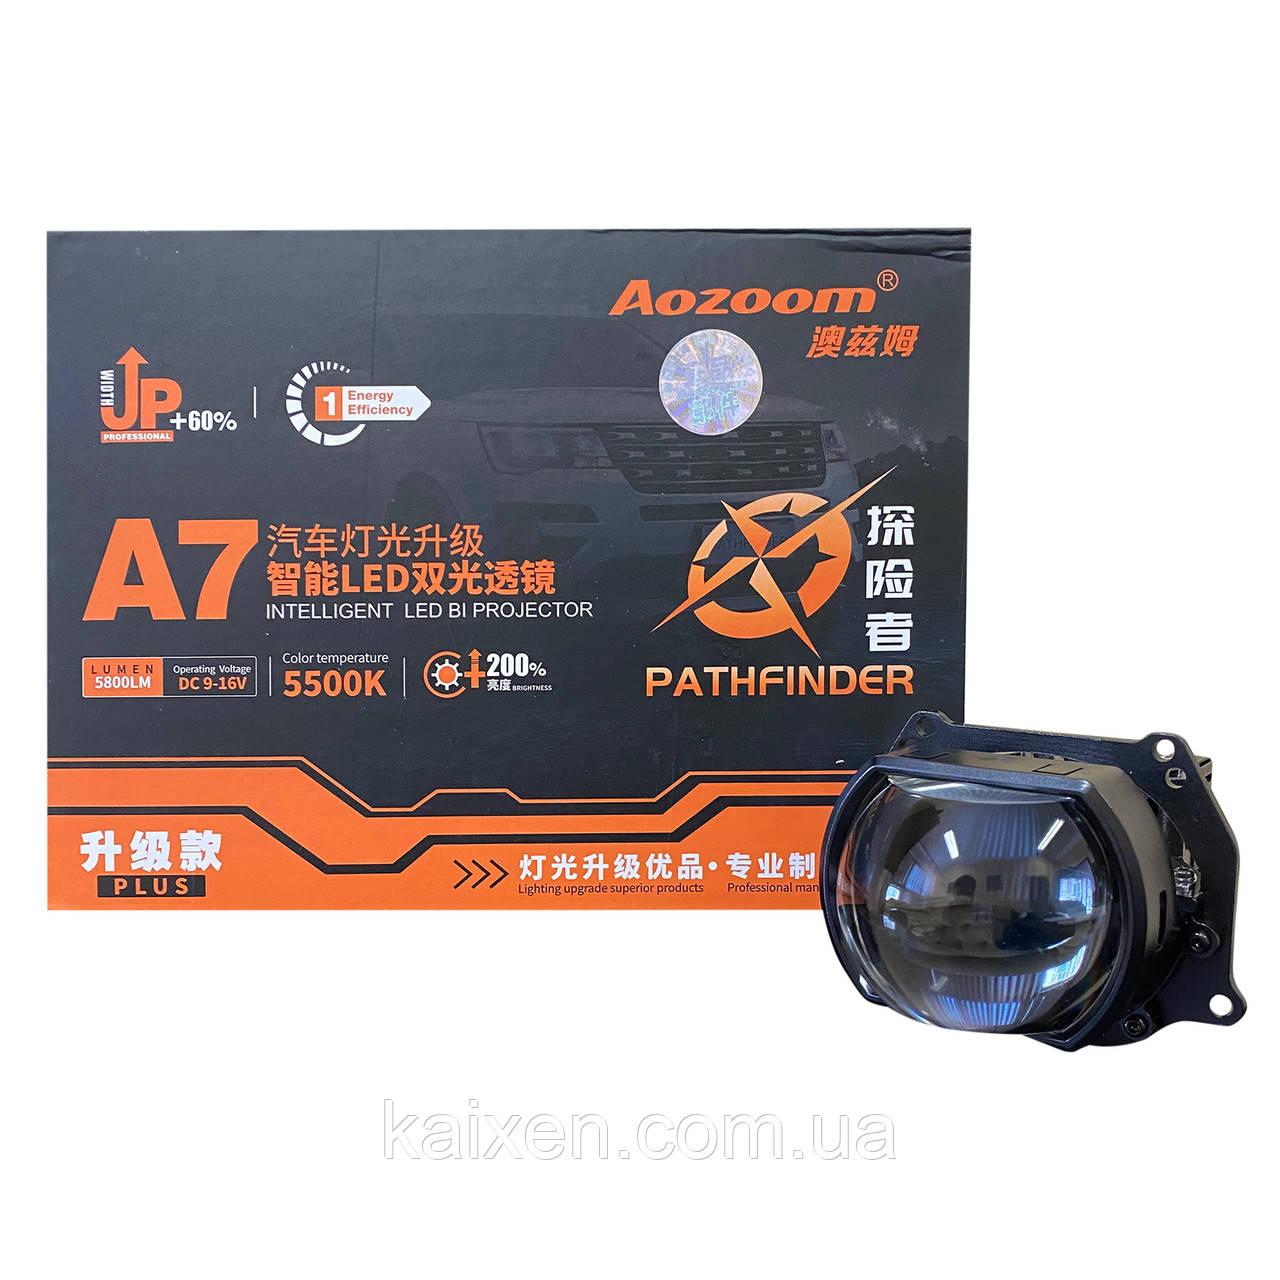 Bi-led лінзи Aozoom A7Pro 3 дюйми (прямокутна лінза)